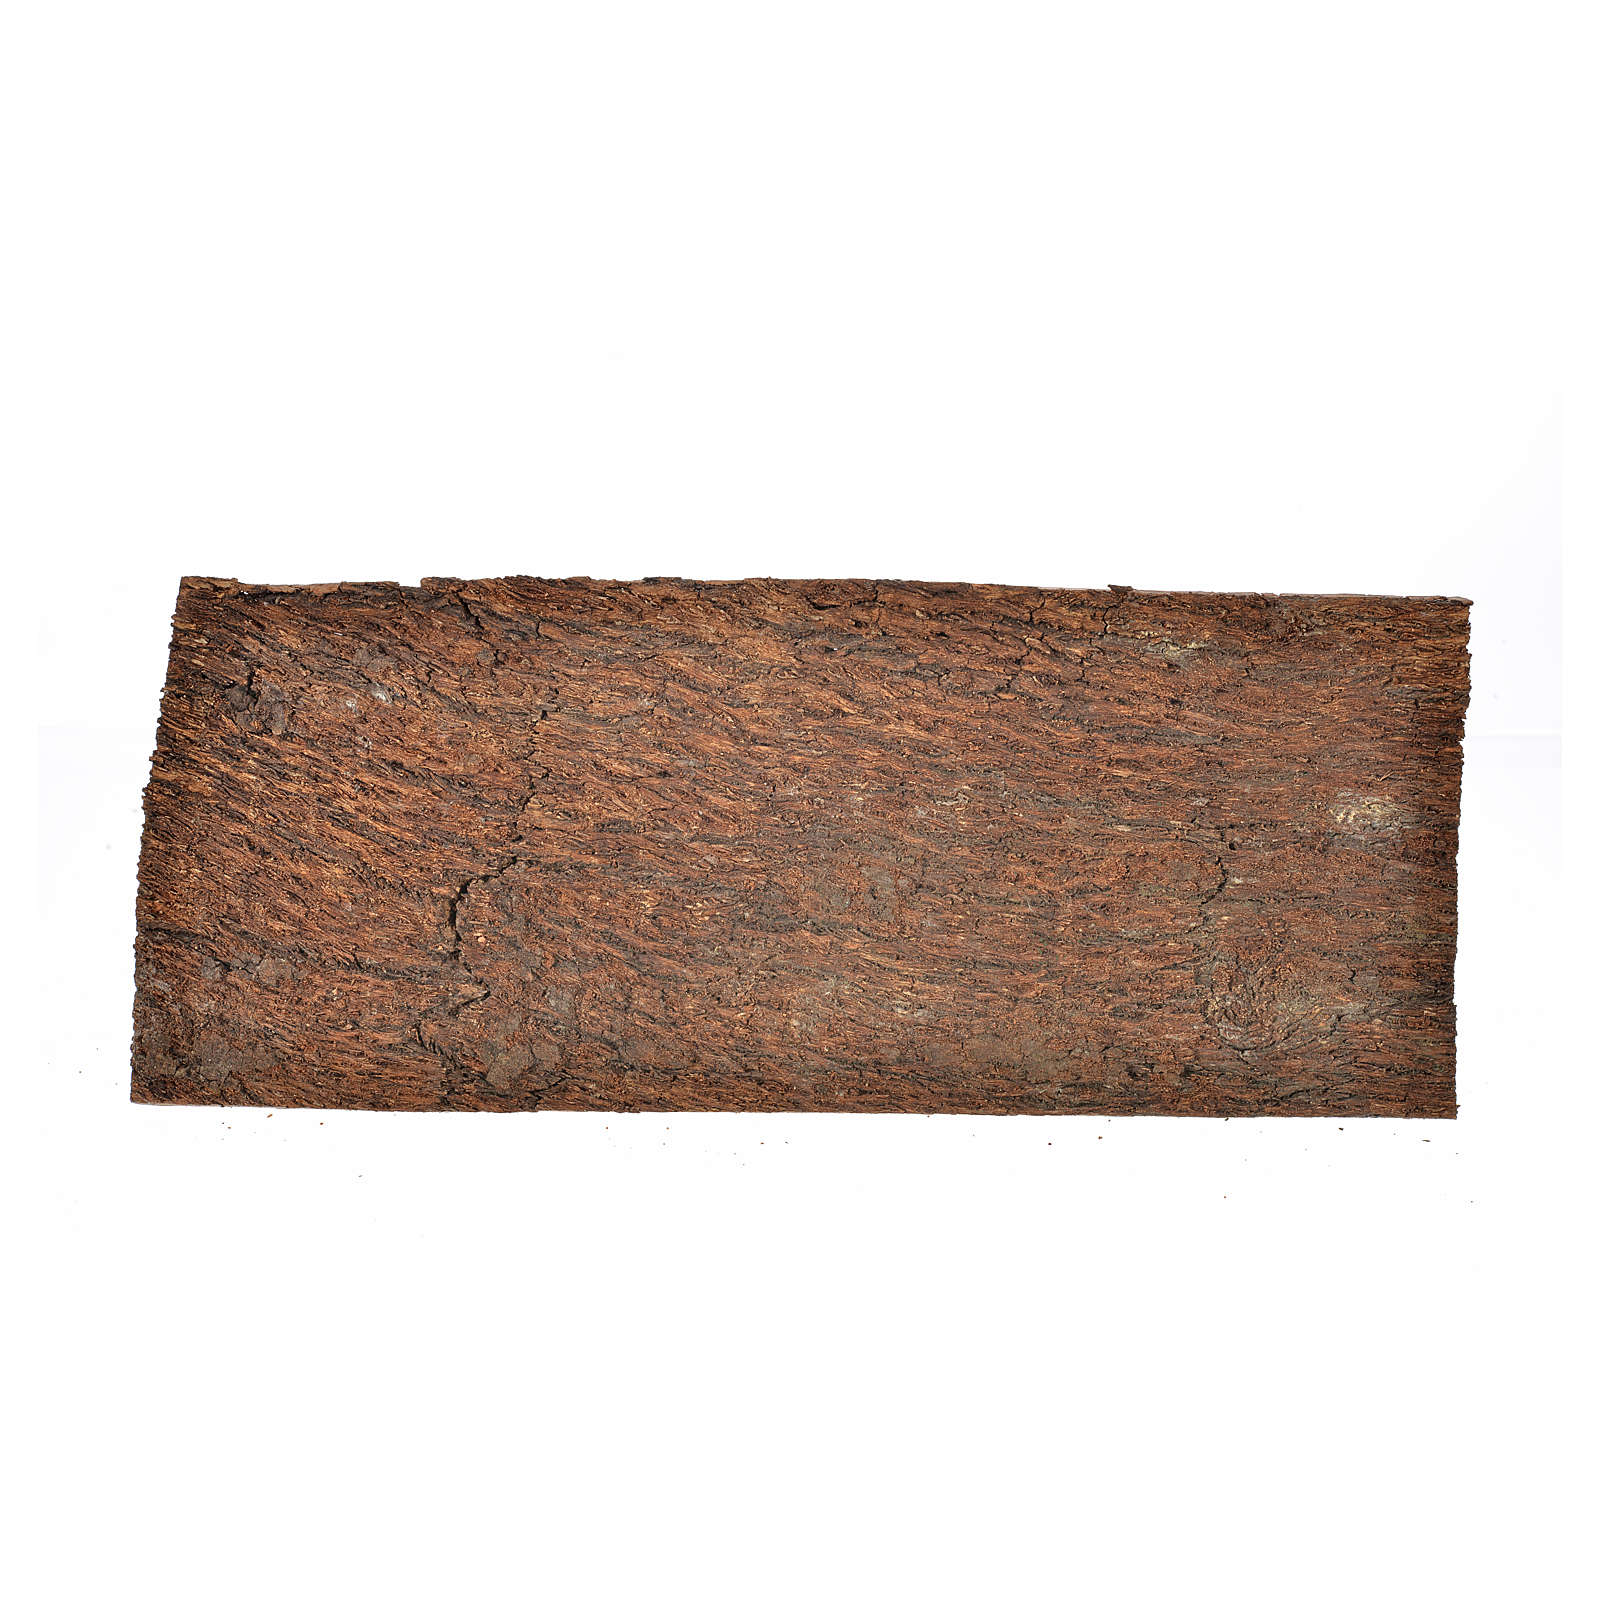 Nativity scene backdrop, cork panel bark effect 25x9x0,7cm 4